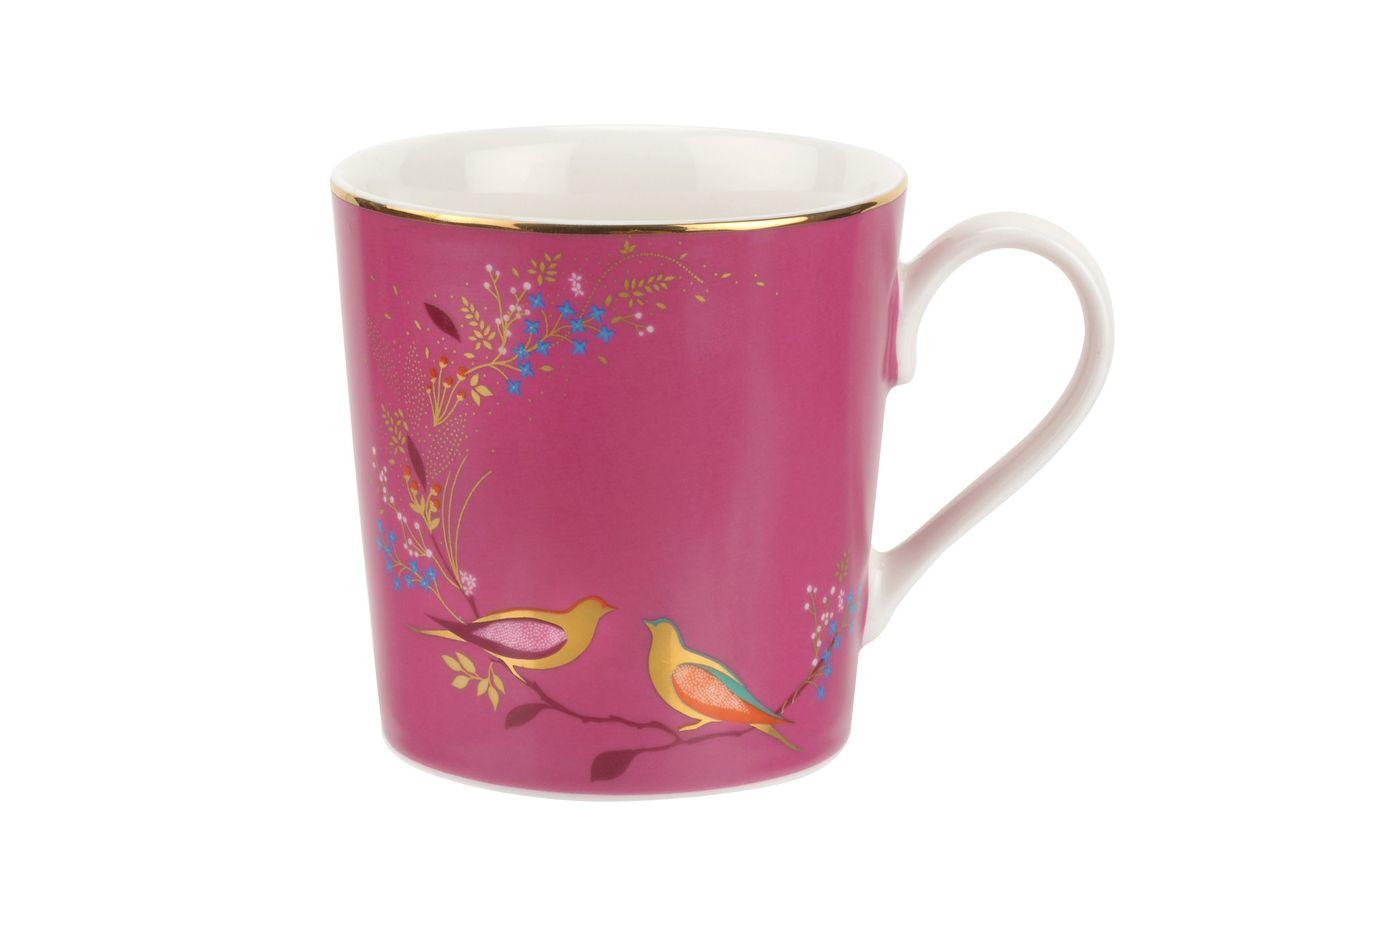 Sara Miller London for Portmeirion Chelsea Collection Mug Pink 0.34l thumb 1